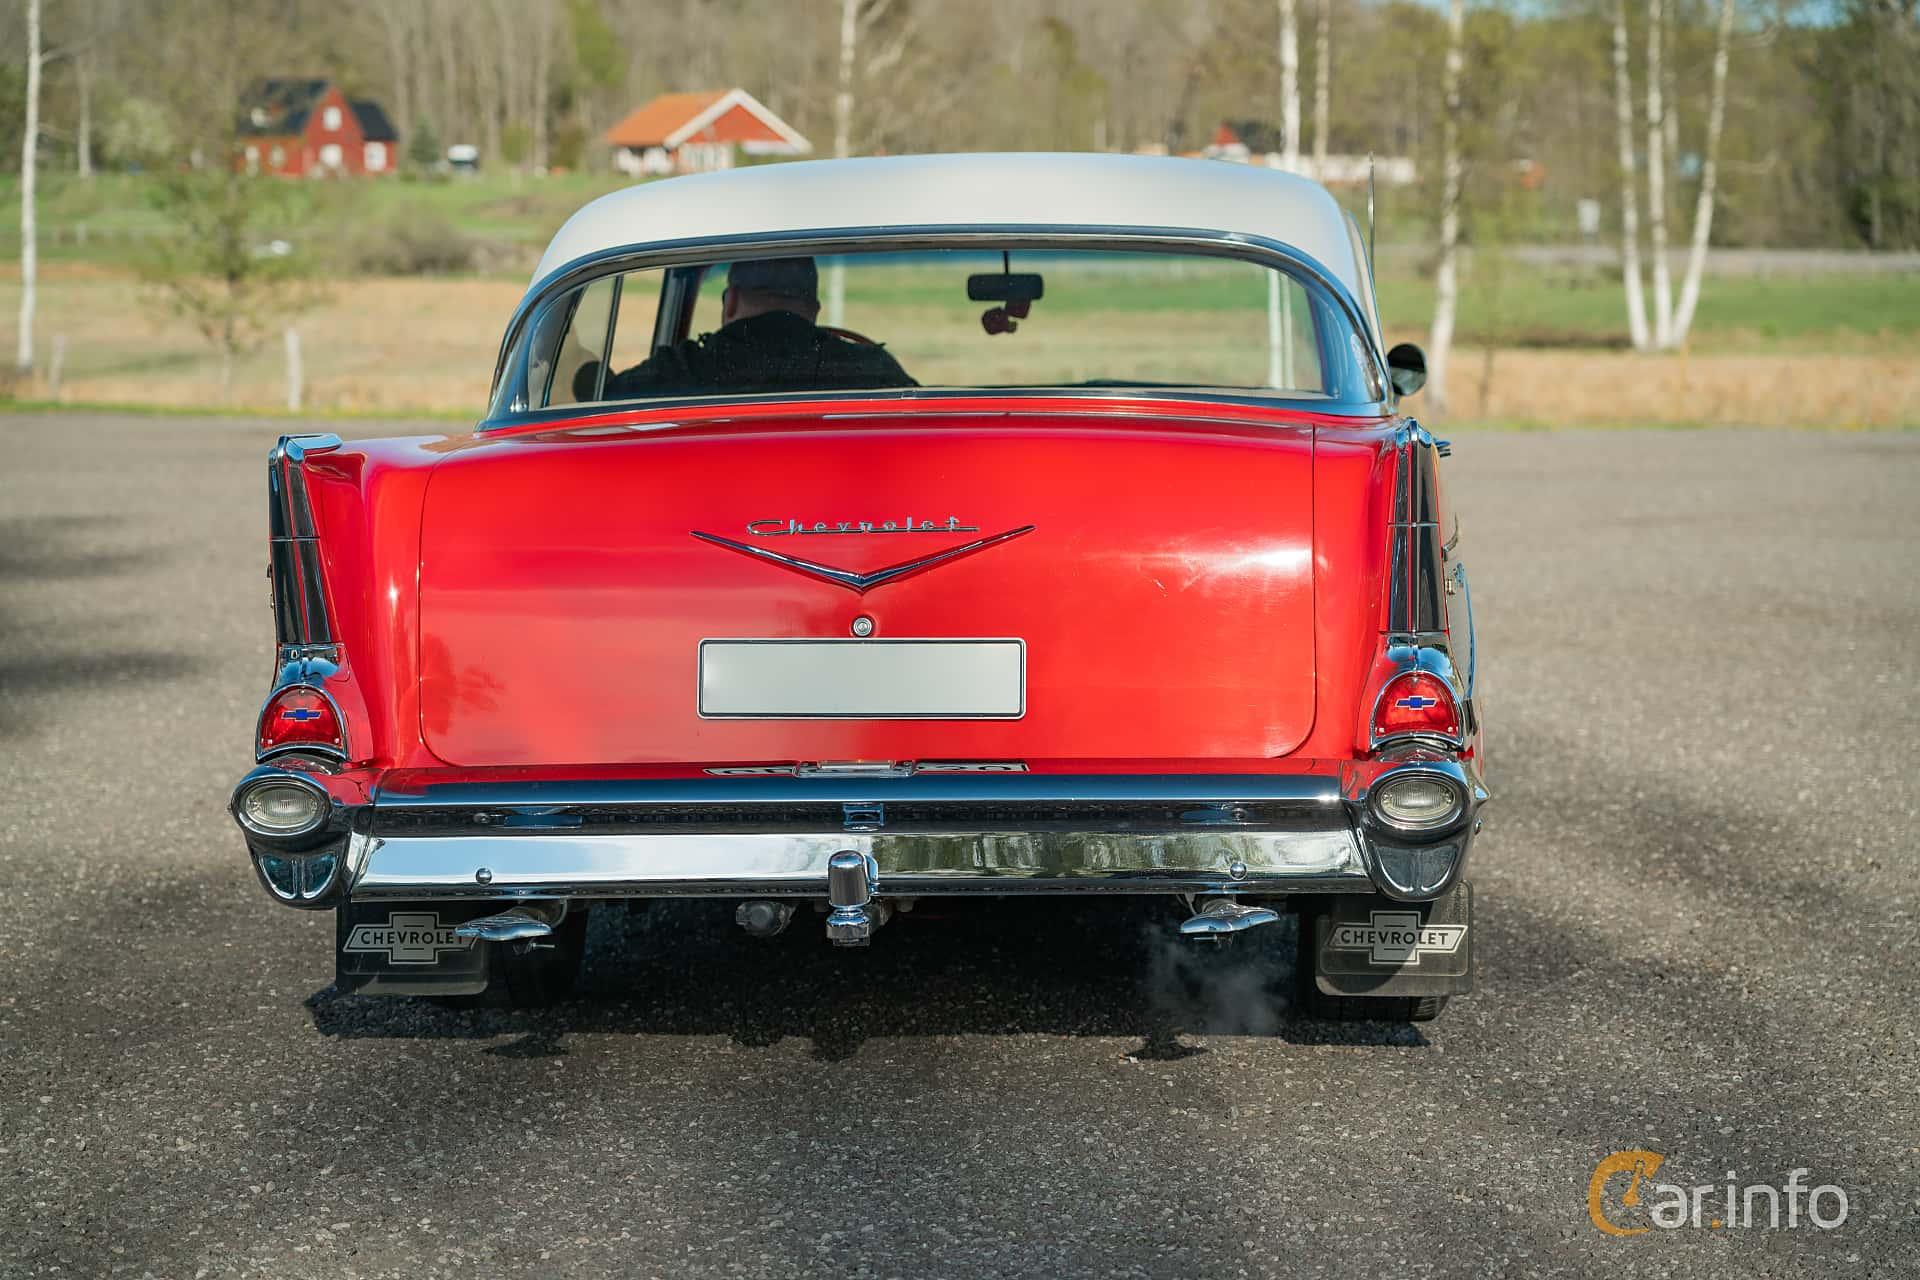 Chevrolet 210 Sport Sedan 3.9 Powerglide, 142hp, 1957 at Lissma Classic Car 2019 vecka 20